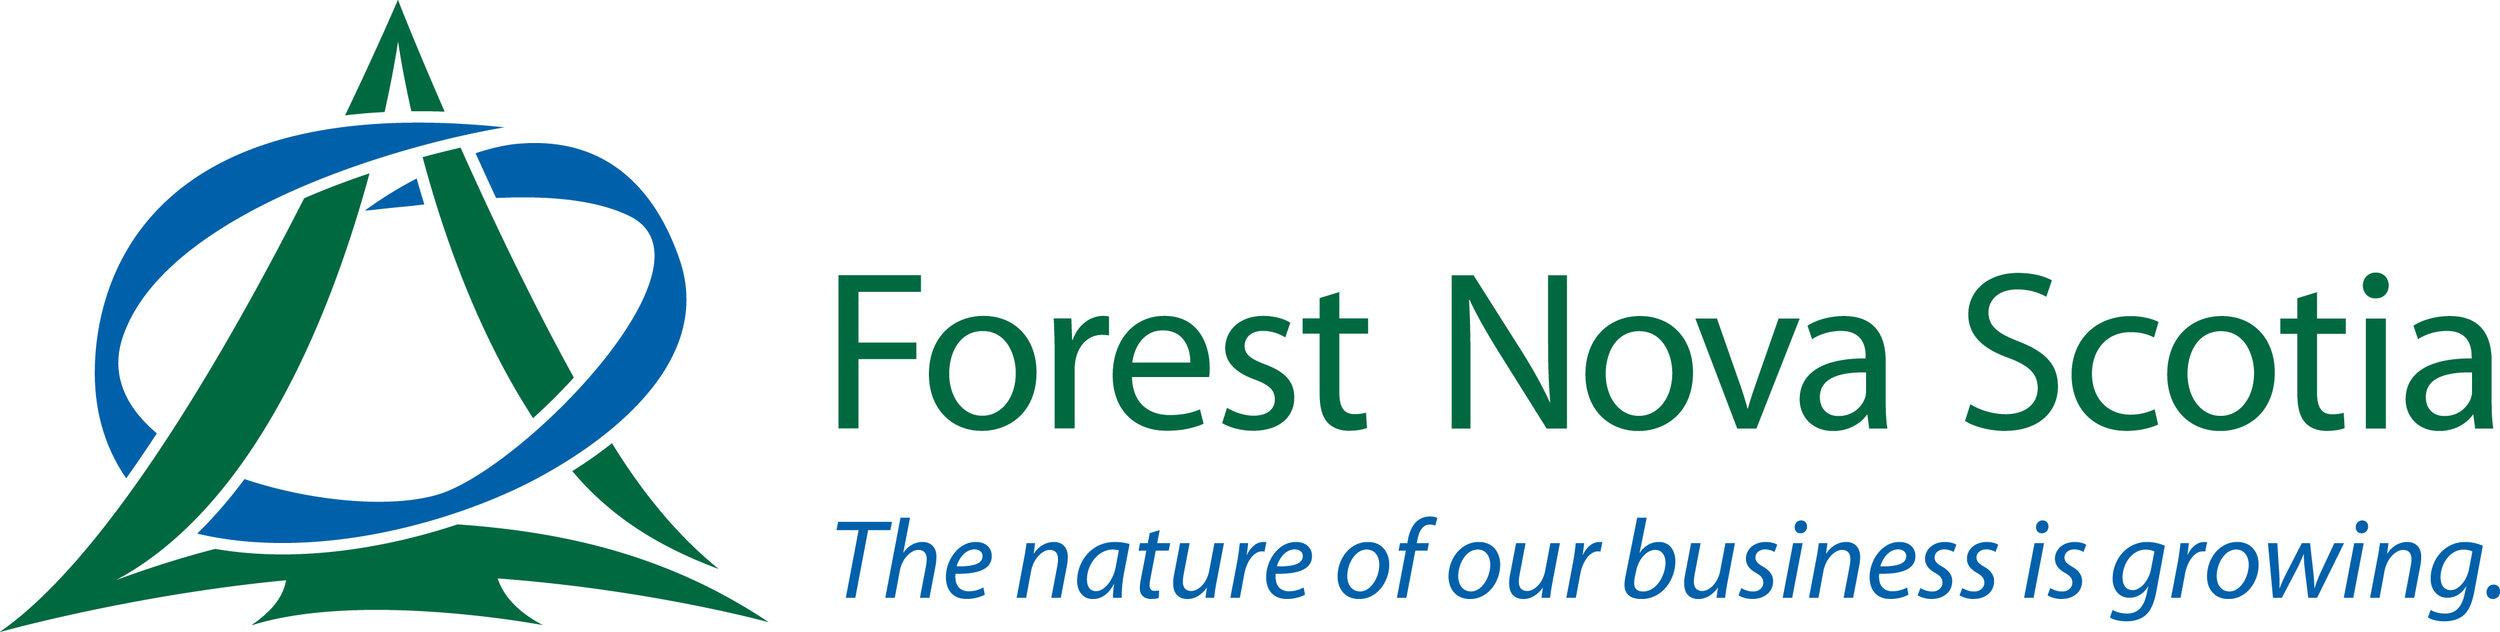 FNS_logo_horiz_tagline_rgb.jpg